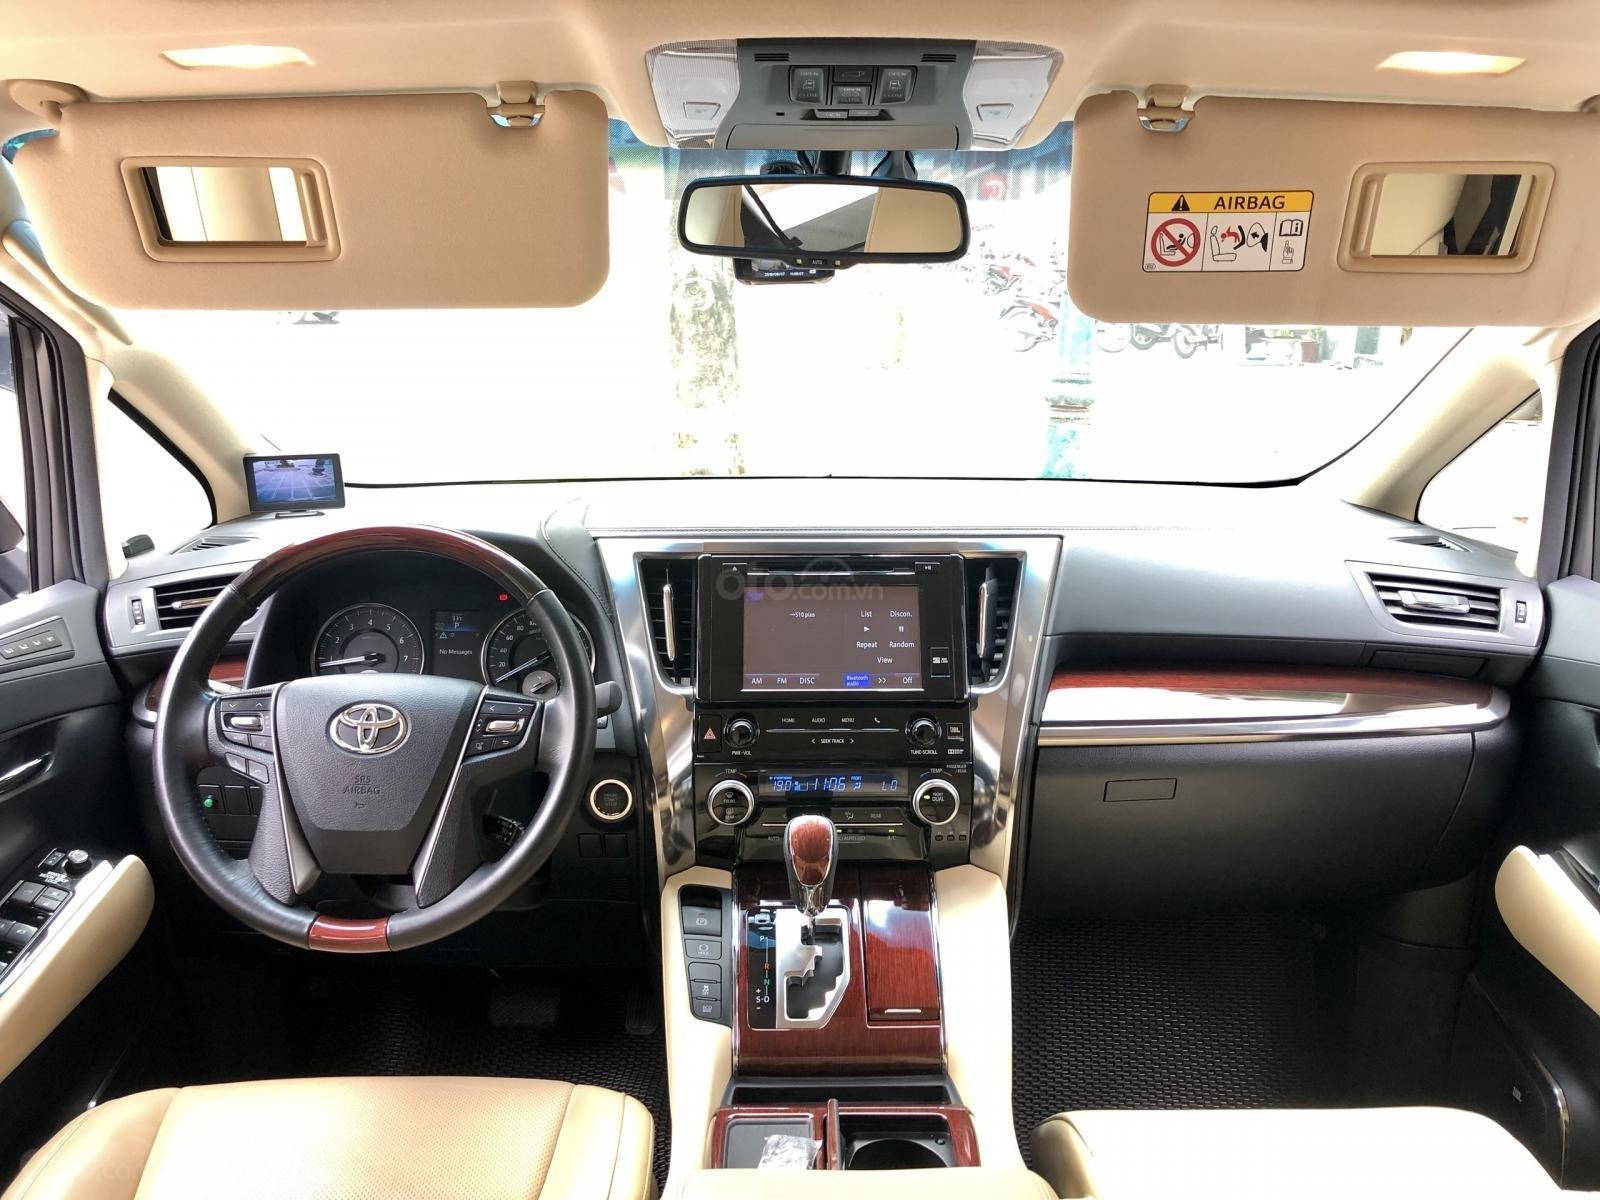 Bán Toyota Alphard 3.5L - V6 sản xuất 2017 model 2018, Mr Huân 0981010161 (14)